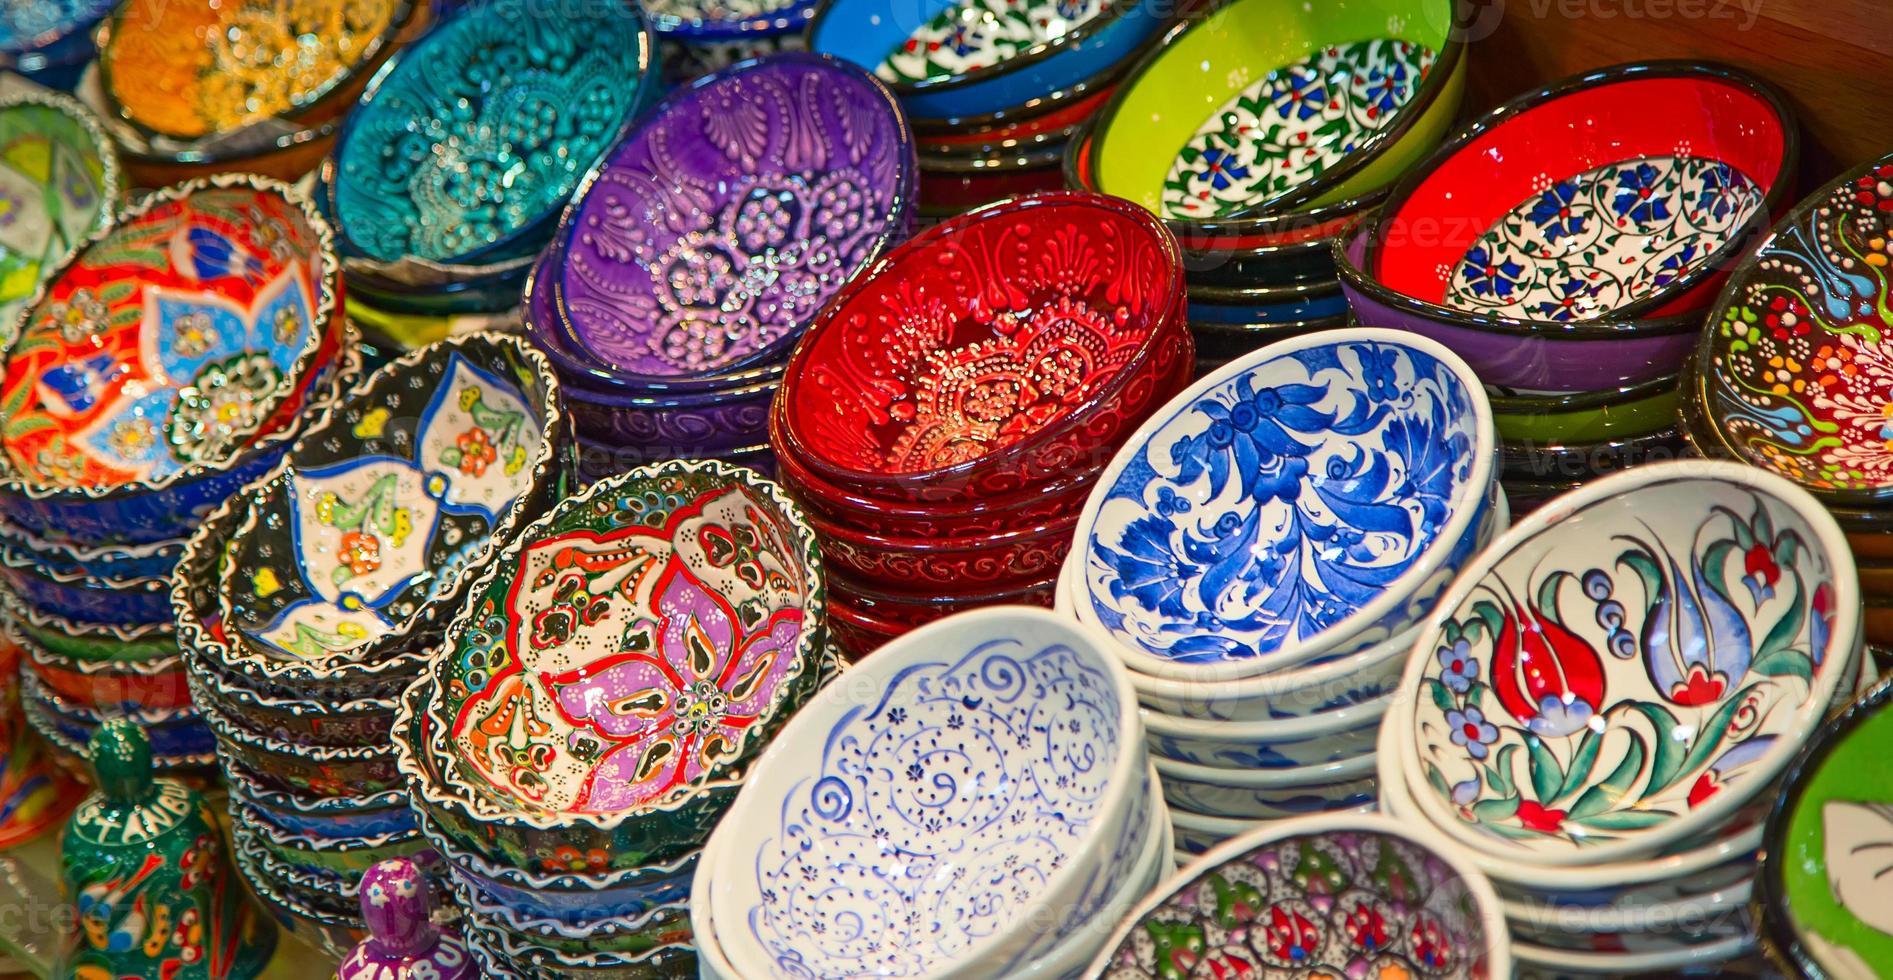 turkiska keramik foto